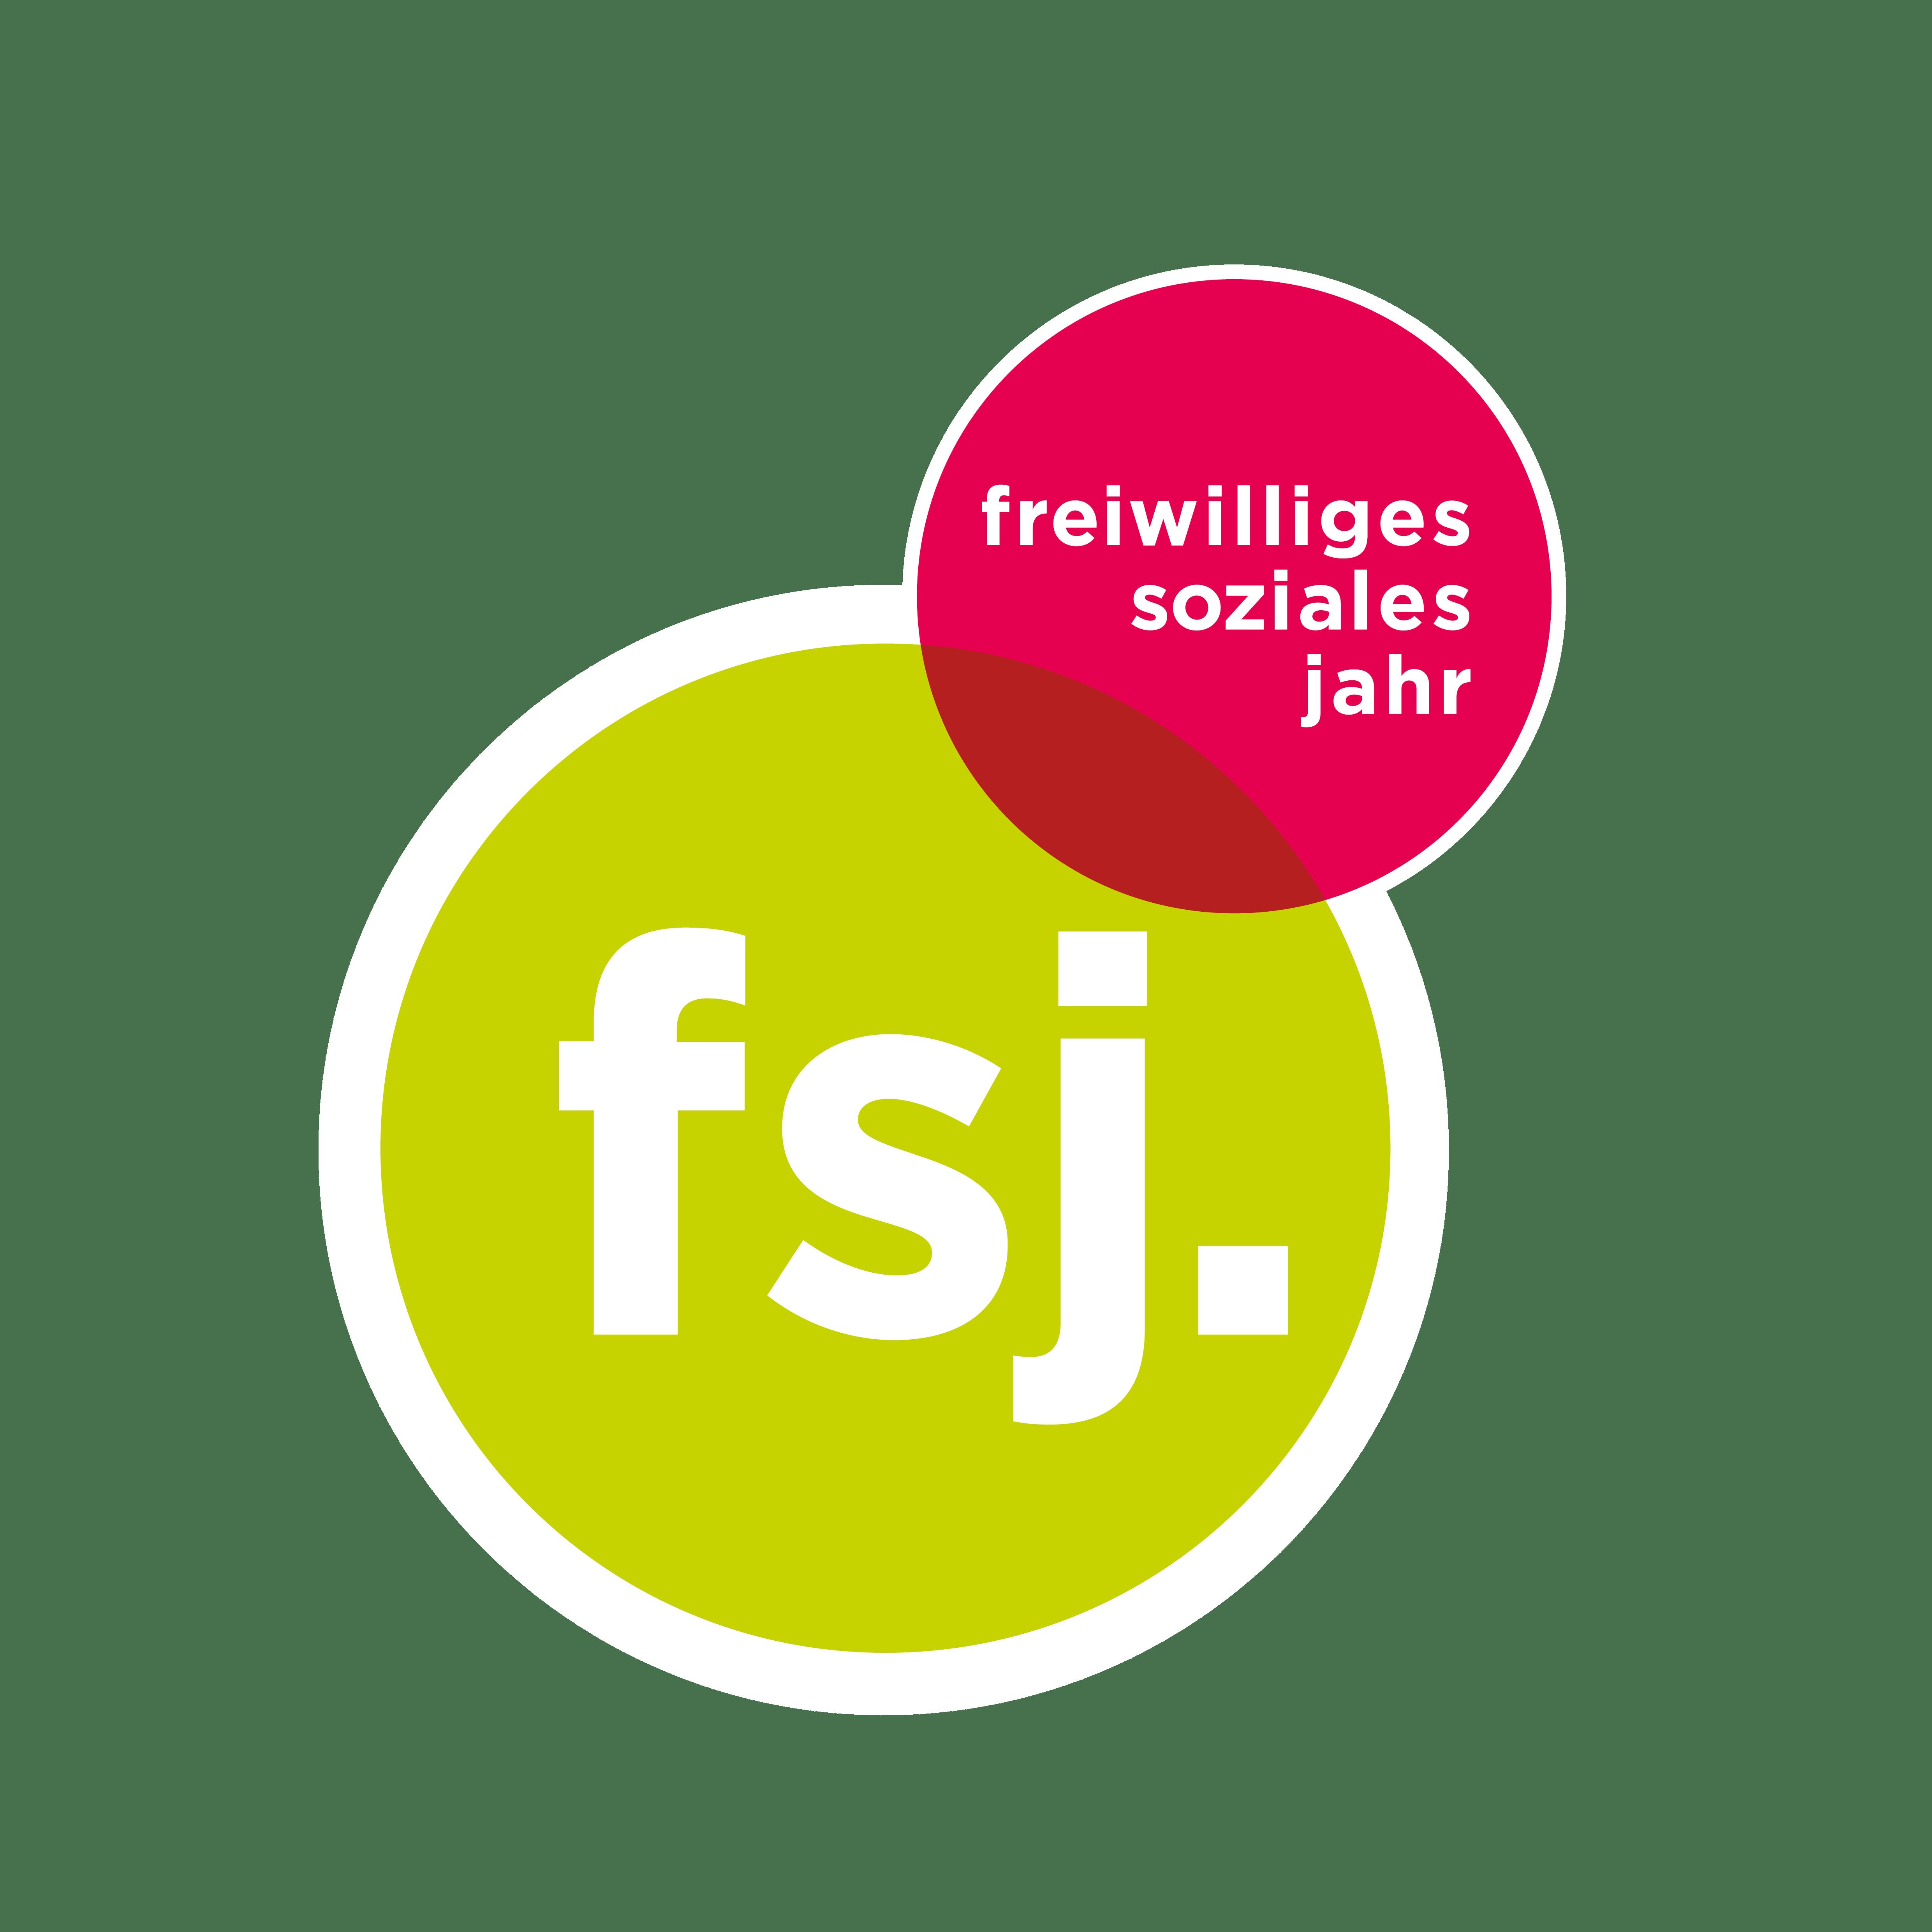 FSJ – Freiwilliges Soziales Jahr